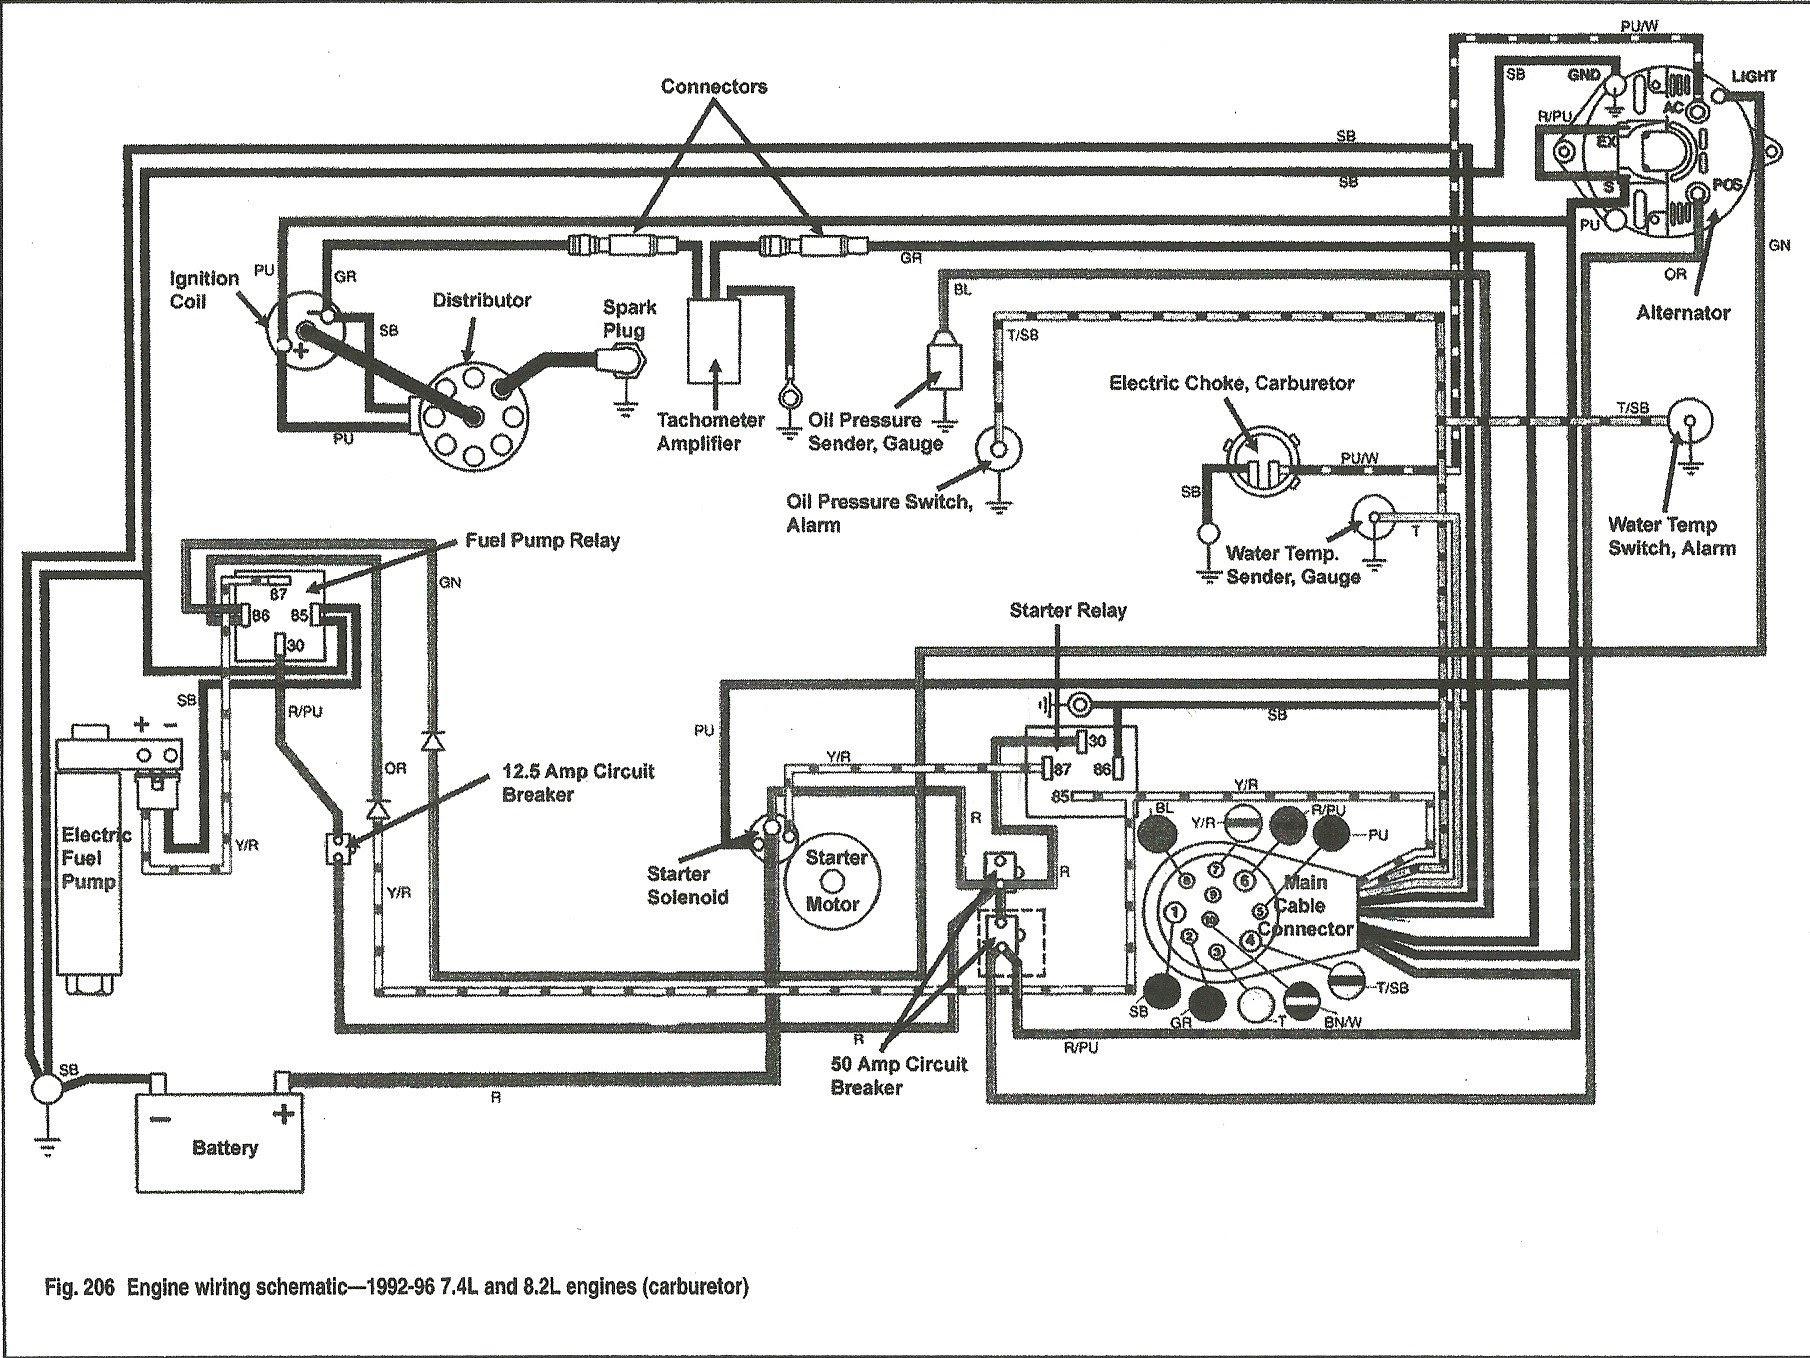 Bed5a2 1986 Bayliner Trophy Wiring Diagram Wiring Resources